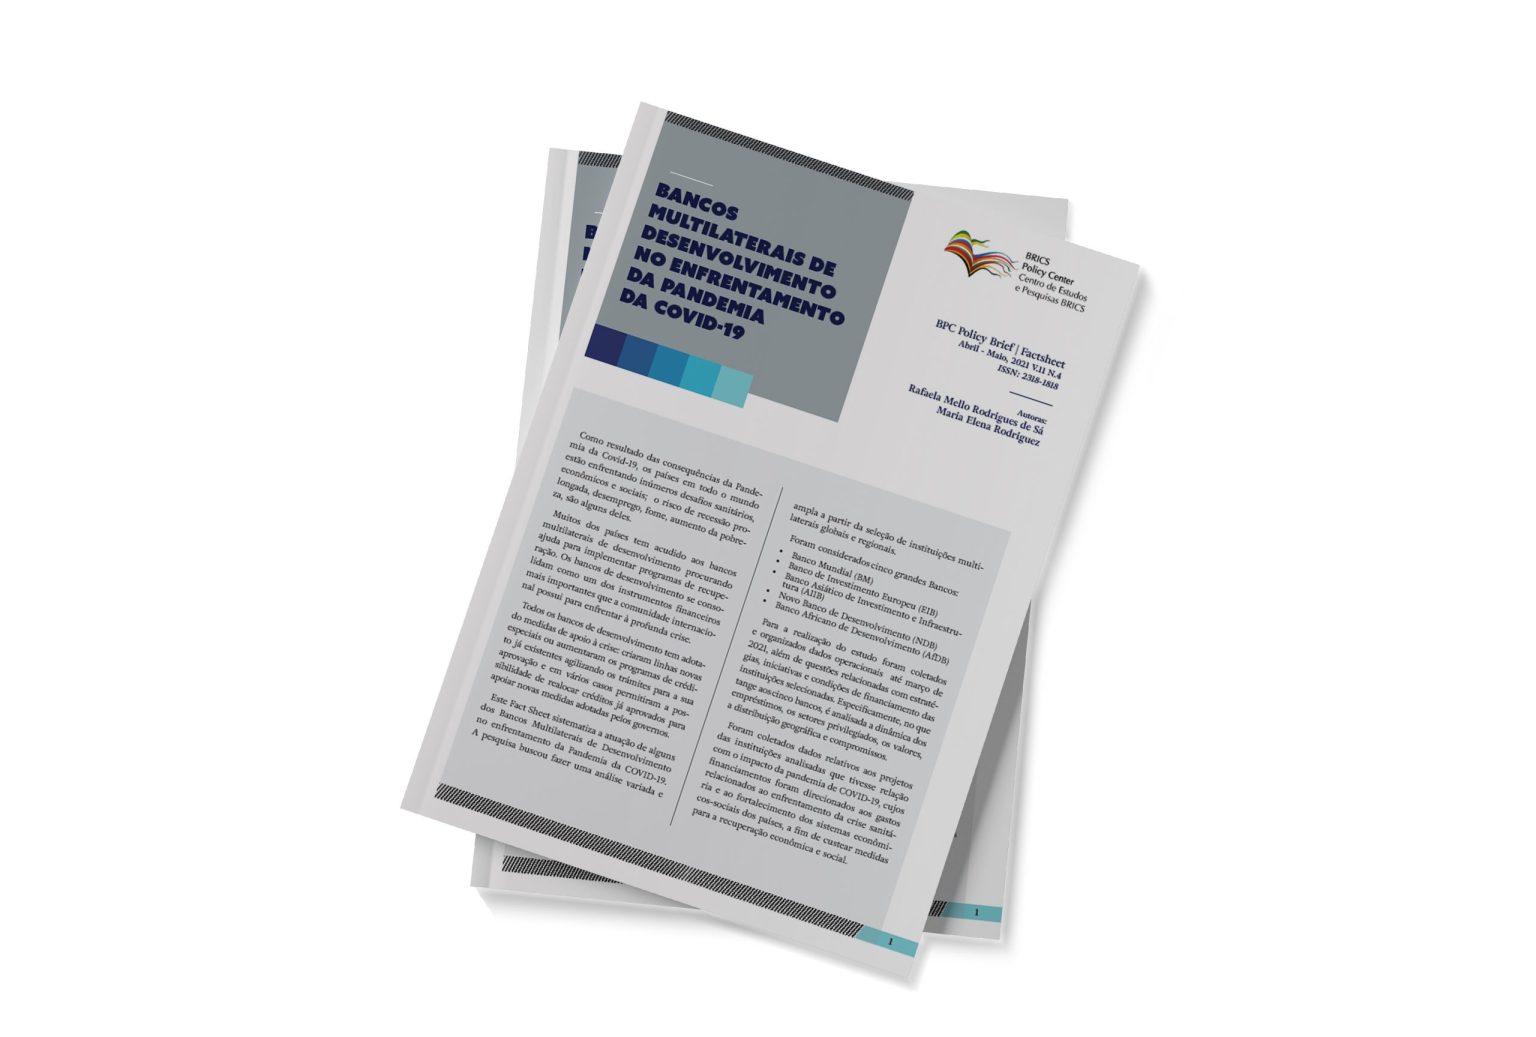 Bancos Multilaterais de Desenvolvimento no enfrentamento da pandemia da Covid-19